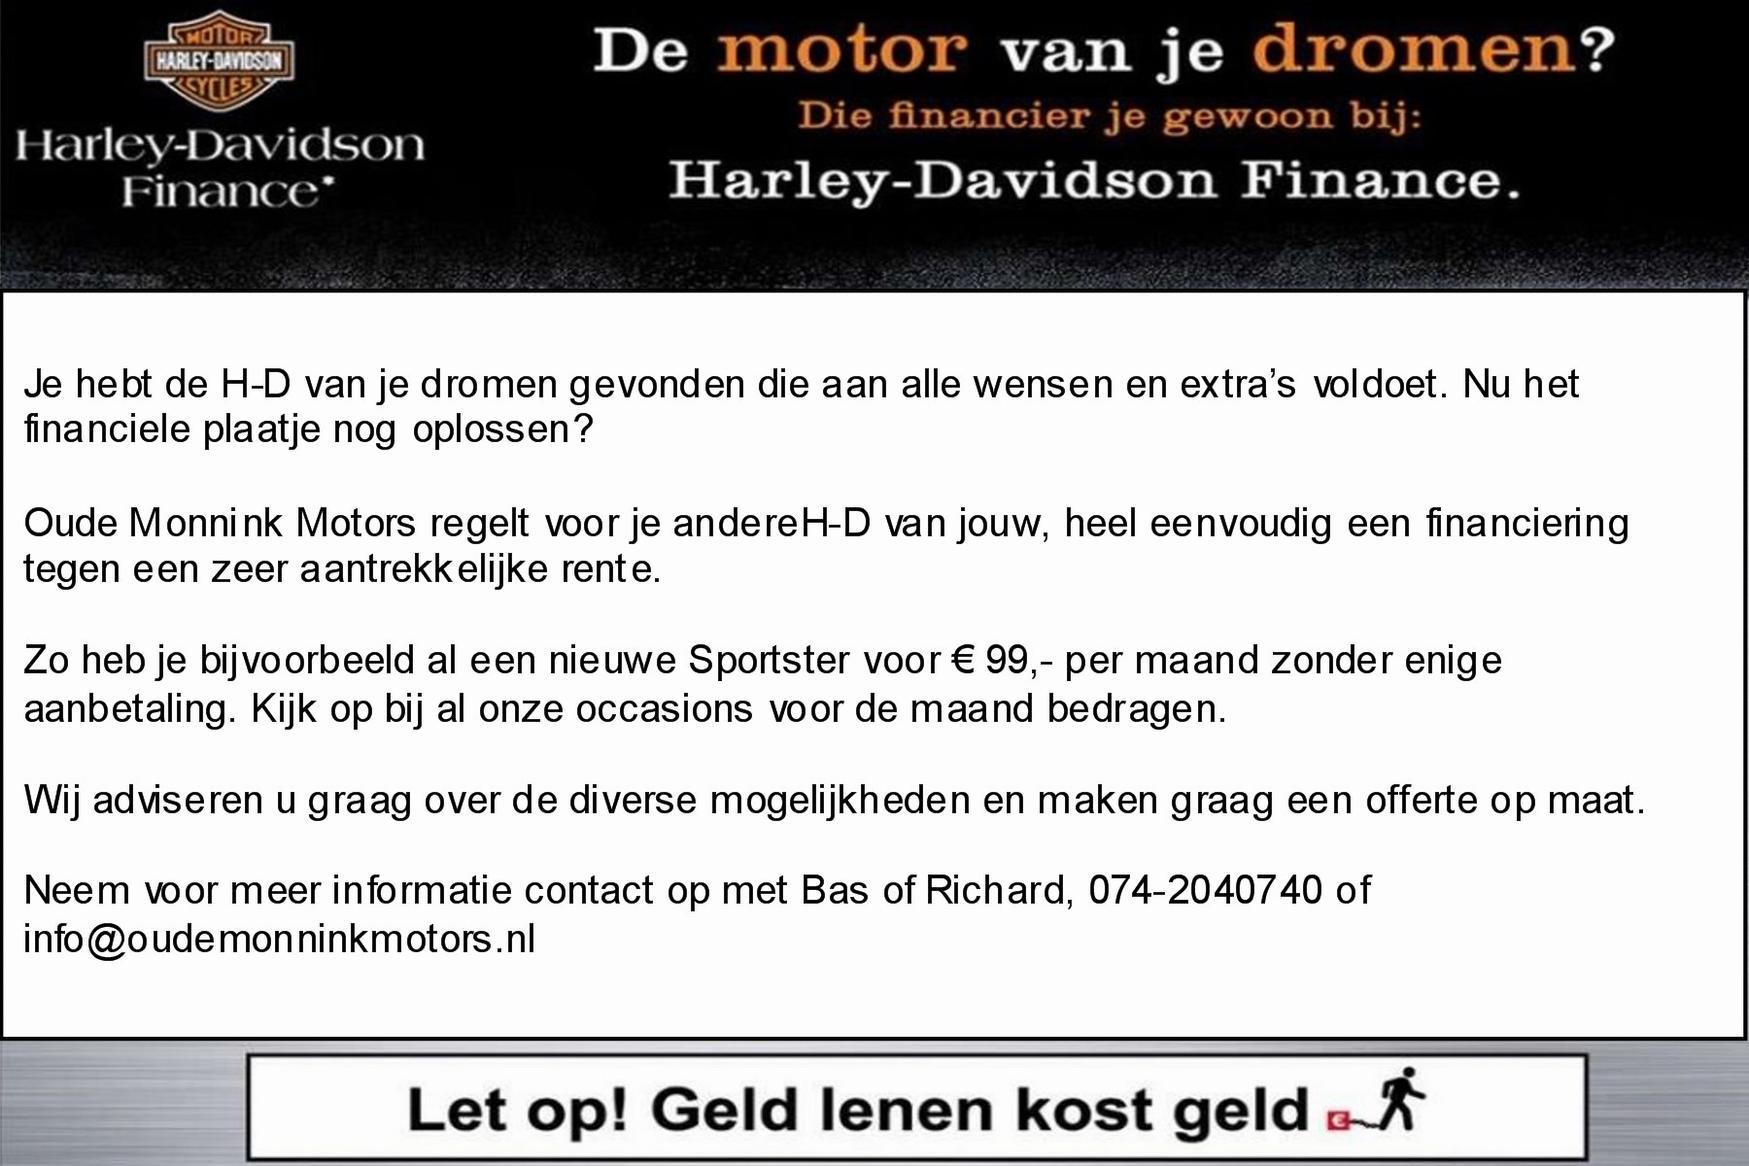 HARLEY-DAVIDSON - FLSTFB Fat Boy Special 1690